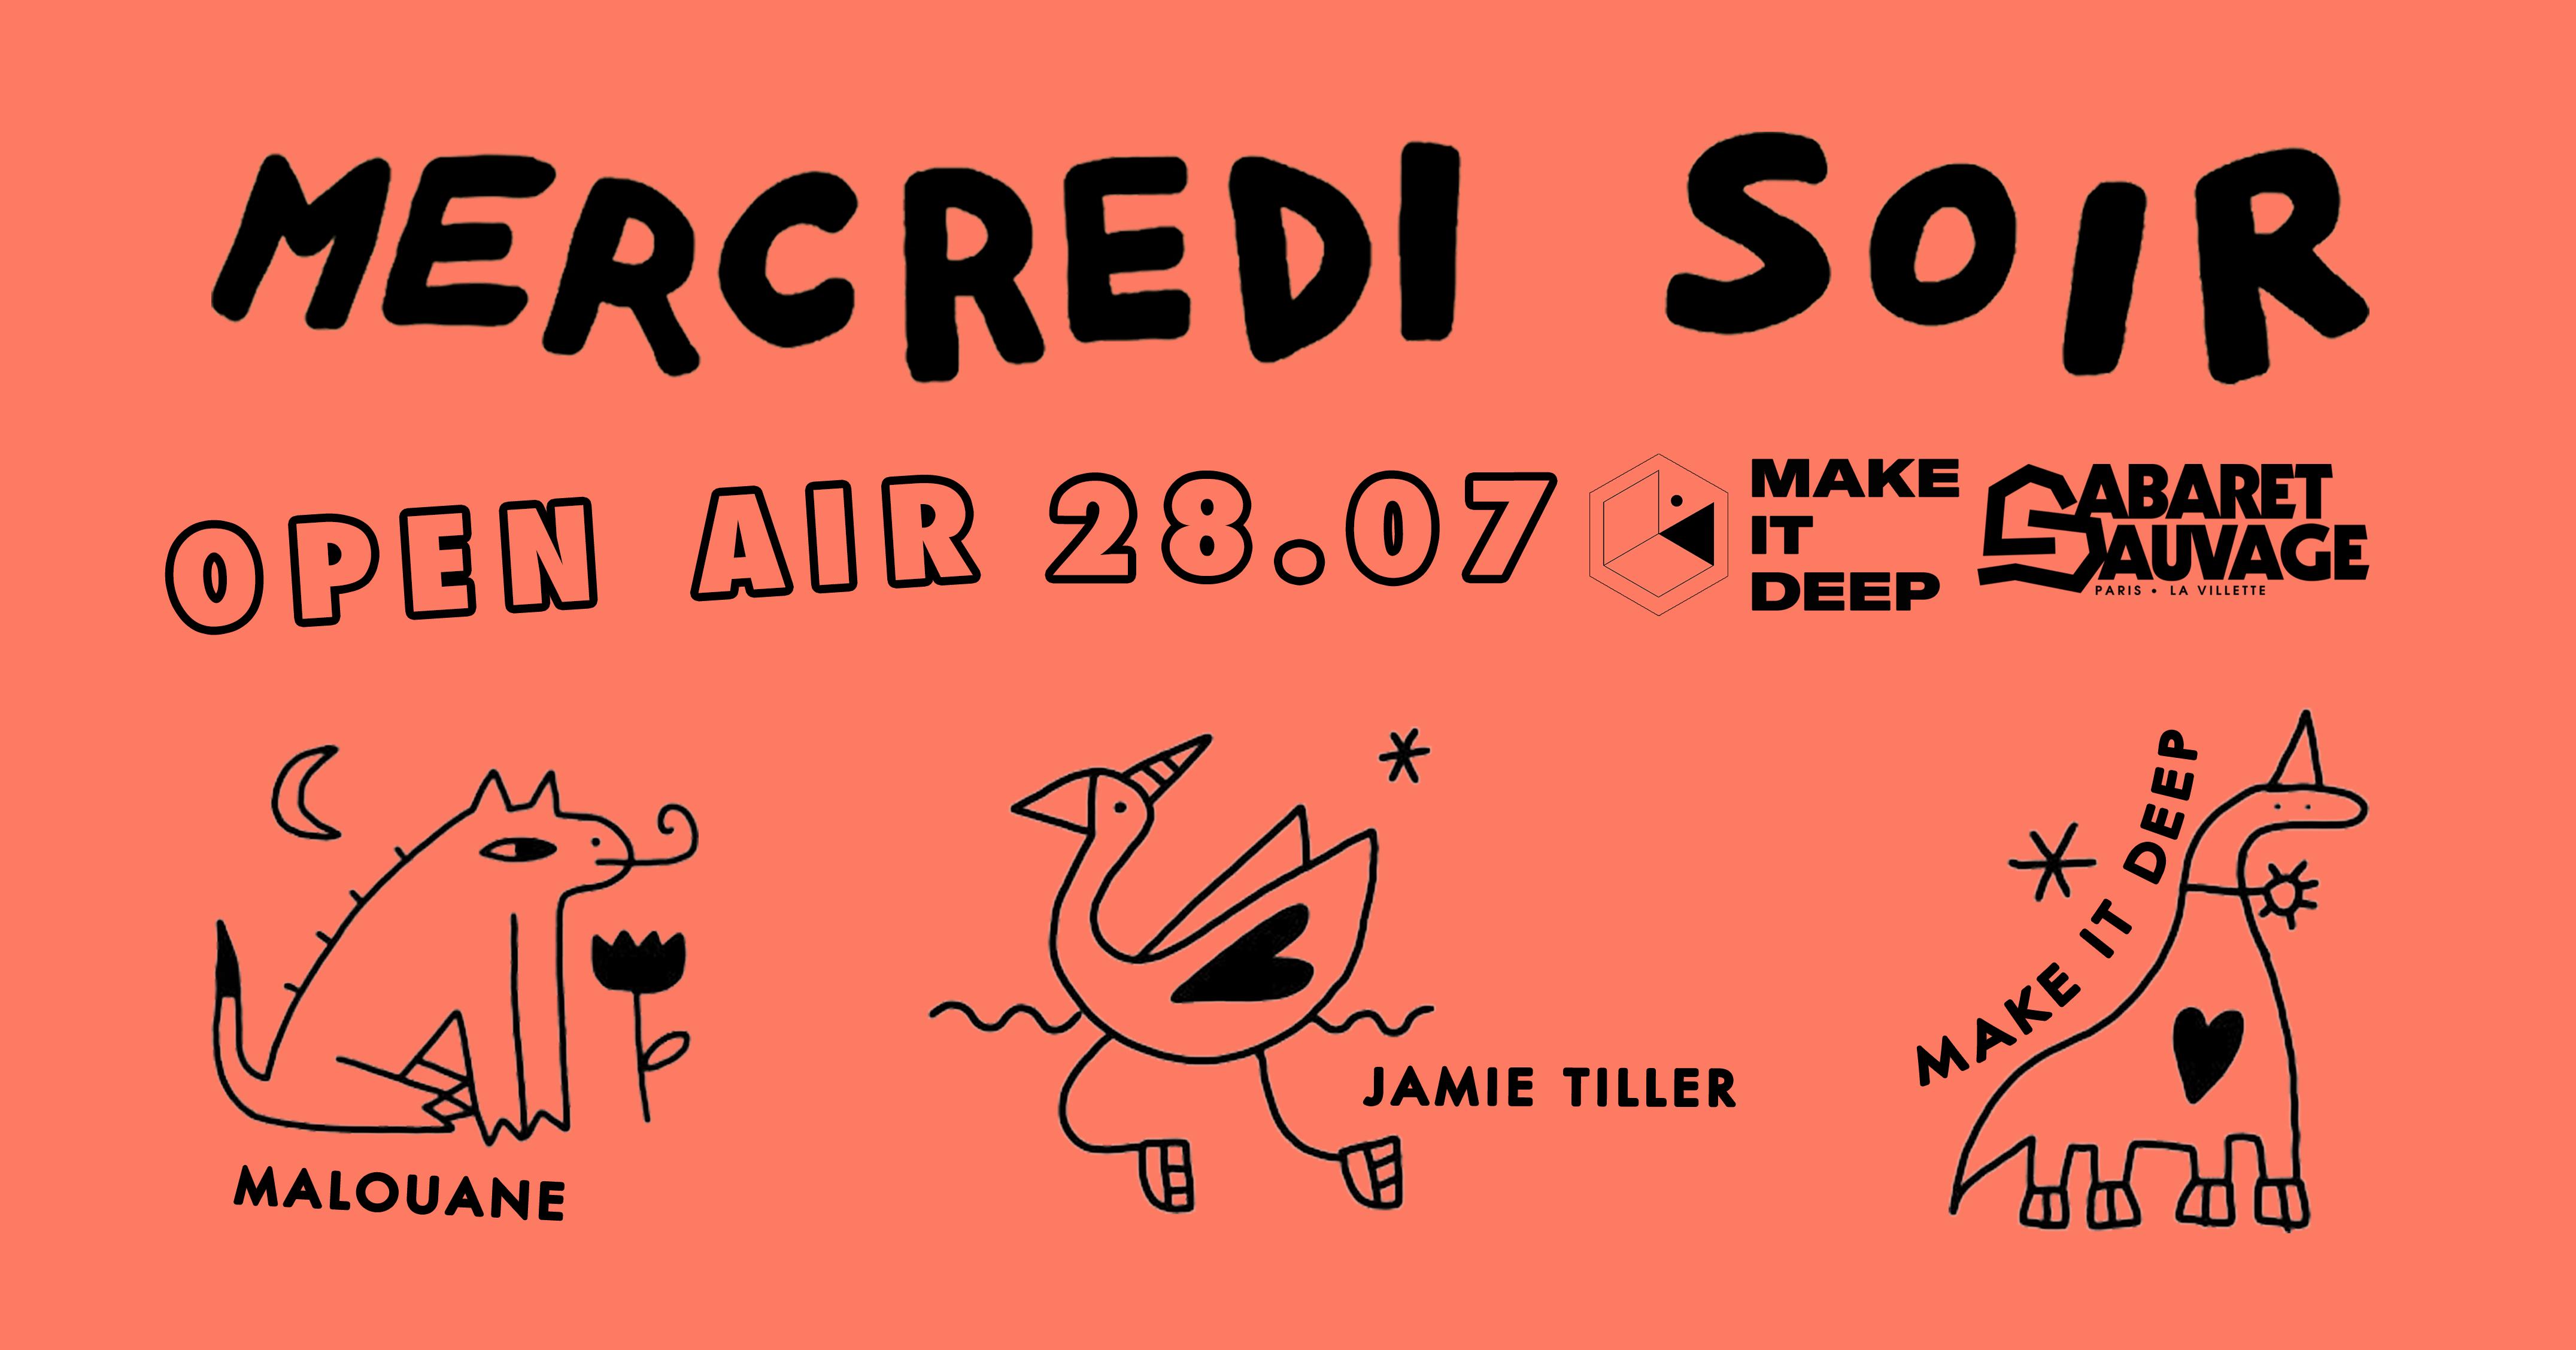 Mercredi Soir x Make It Deep : Jamie Tiller, Malouane, Make It Deep